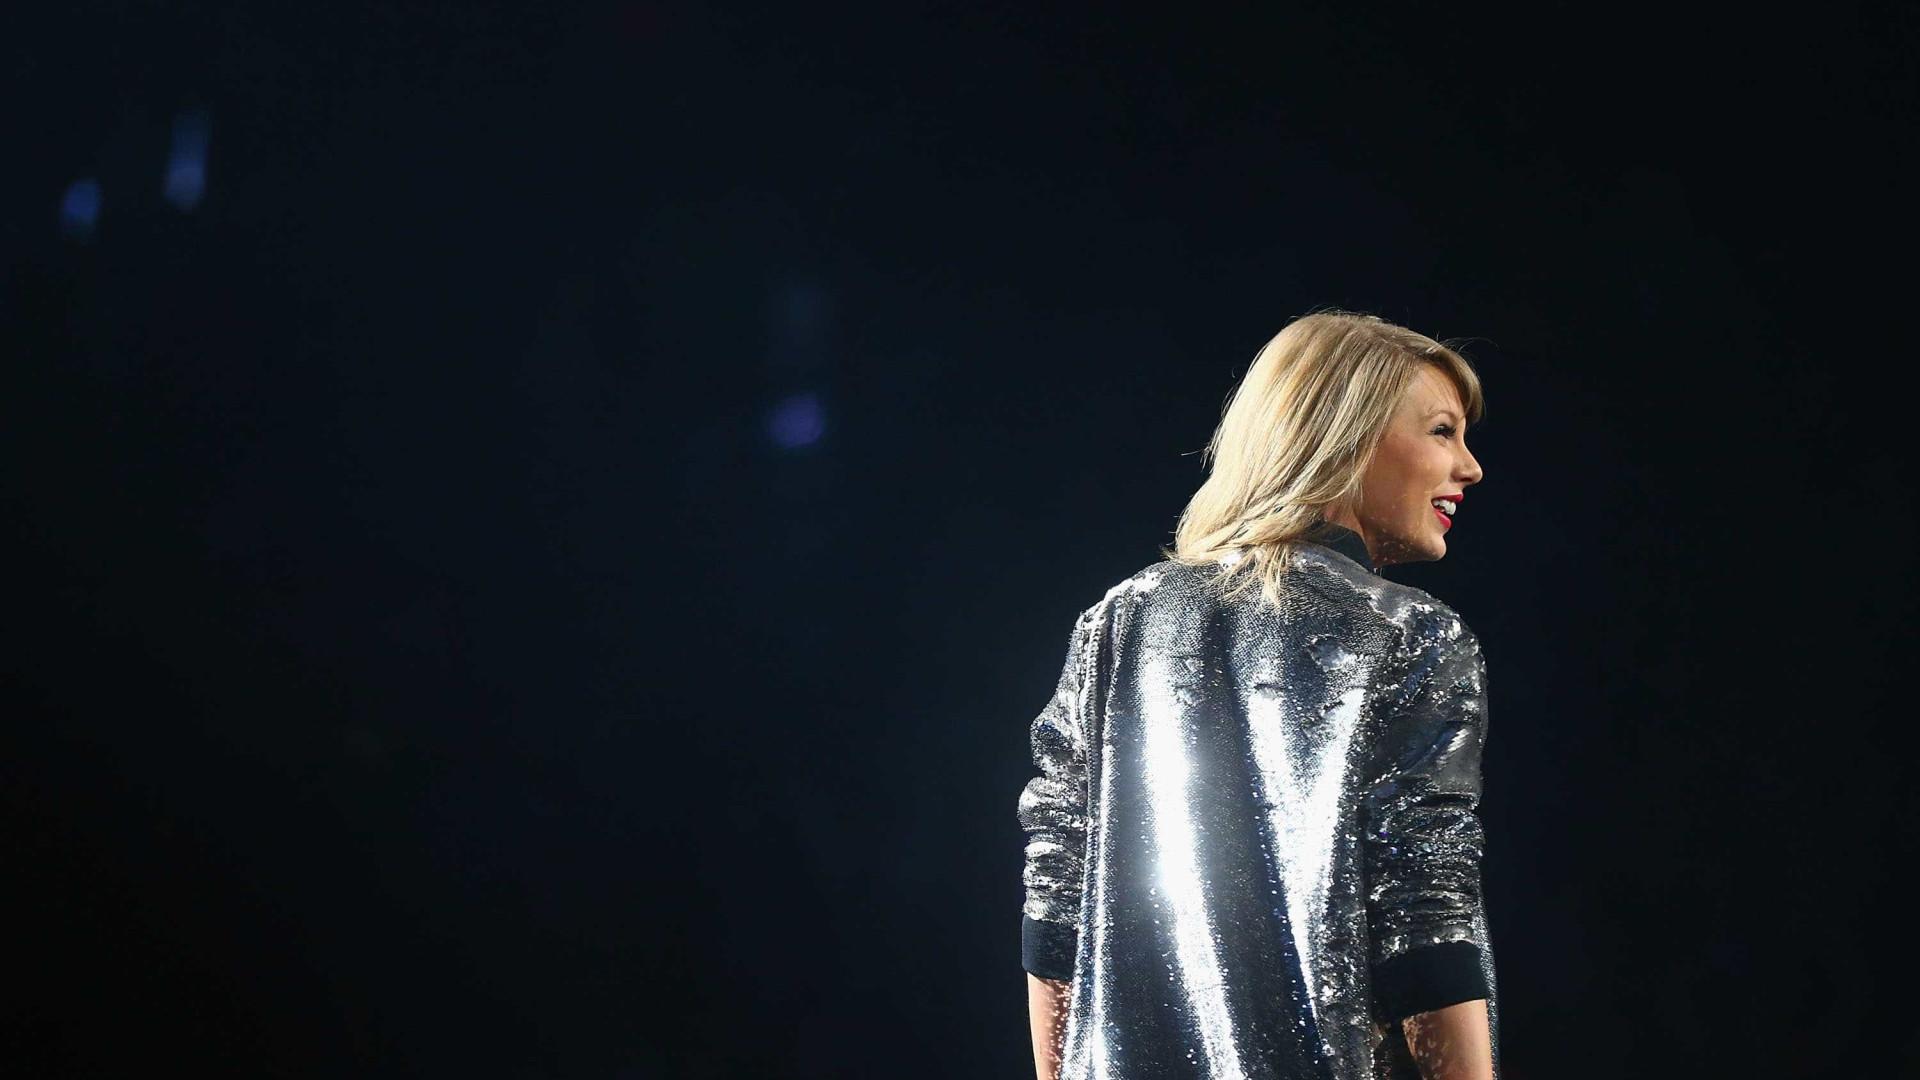 Taylor Swift recorda assédio sexual em rara entrevista